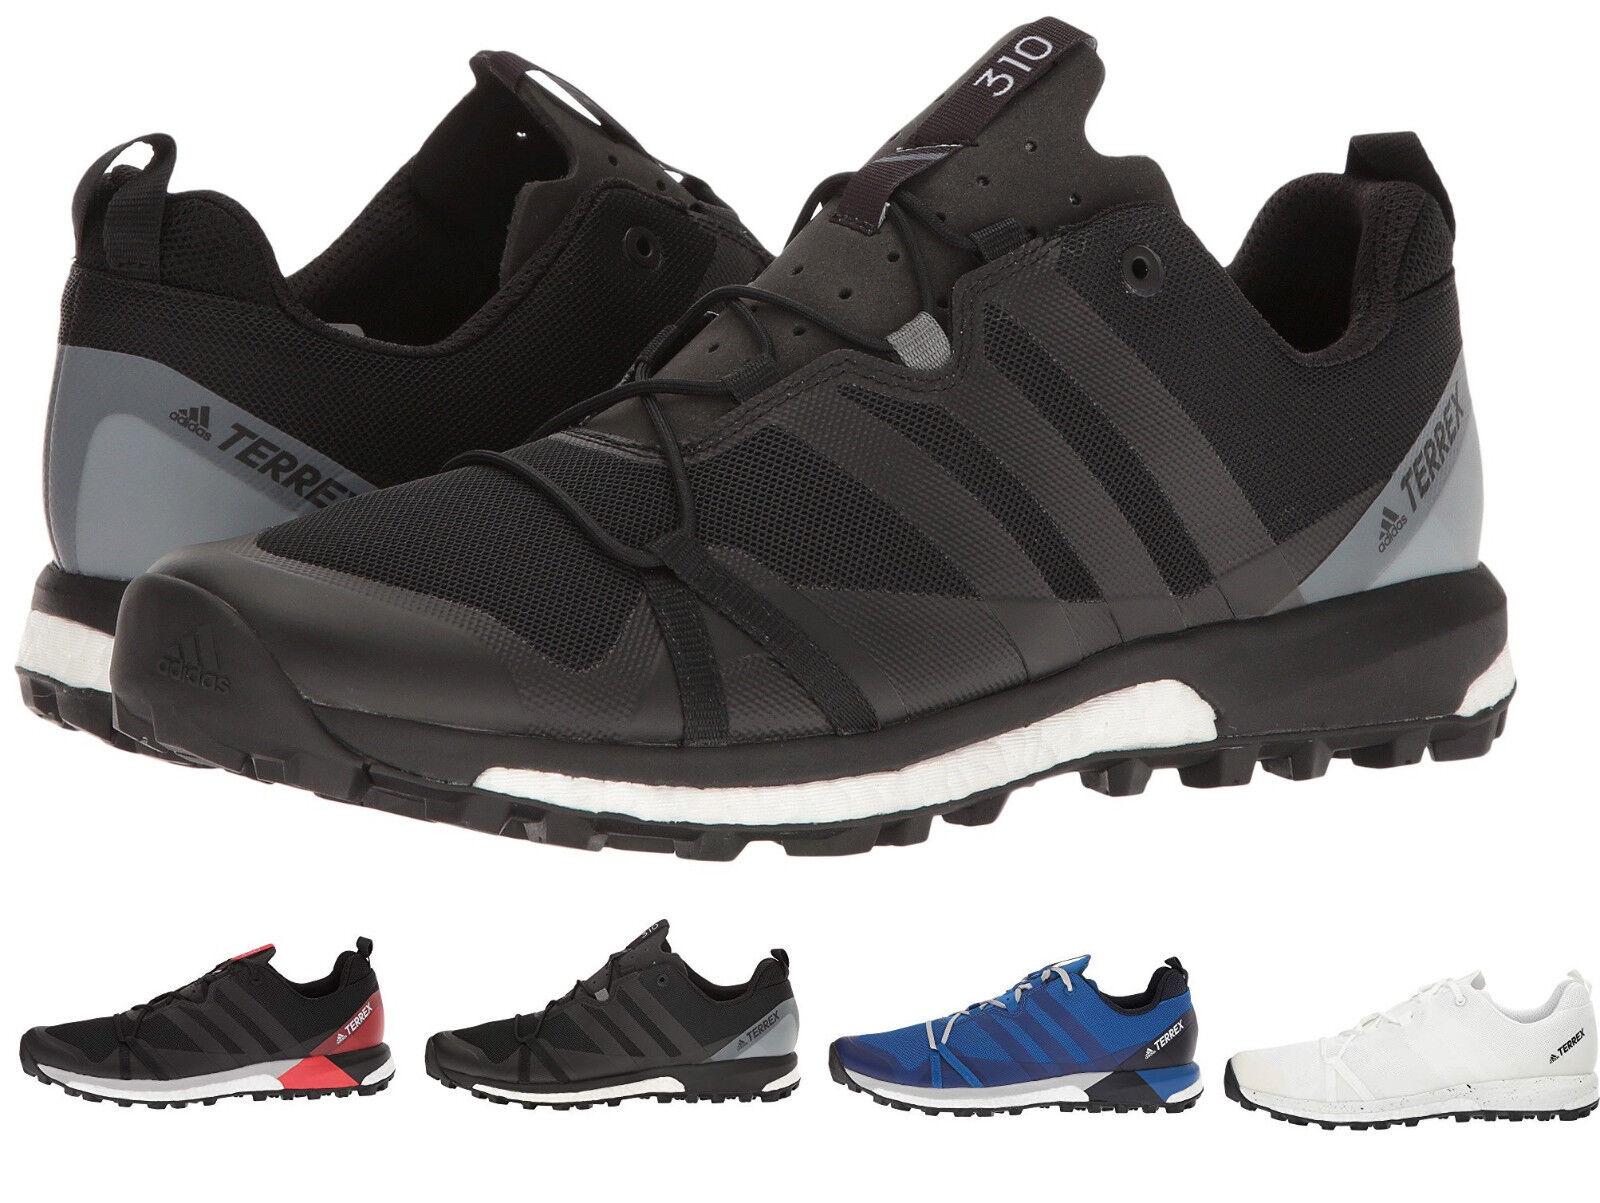 Adidas Terrex Agravic GTX AF6119 Outdoor Gore Tex Trail Running Shoes Men's 8